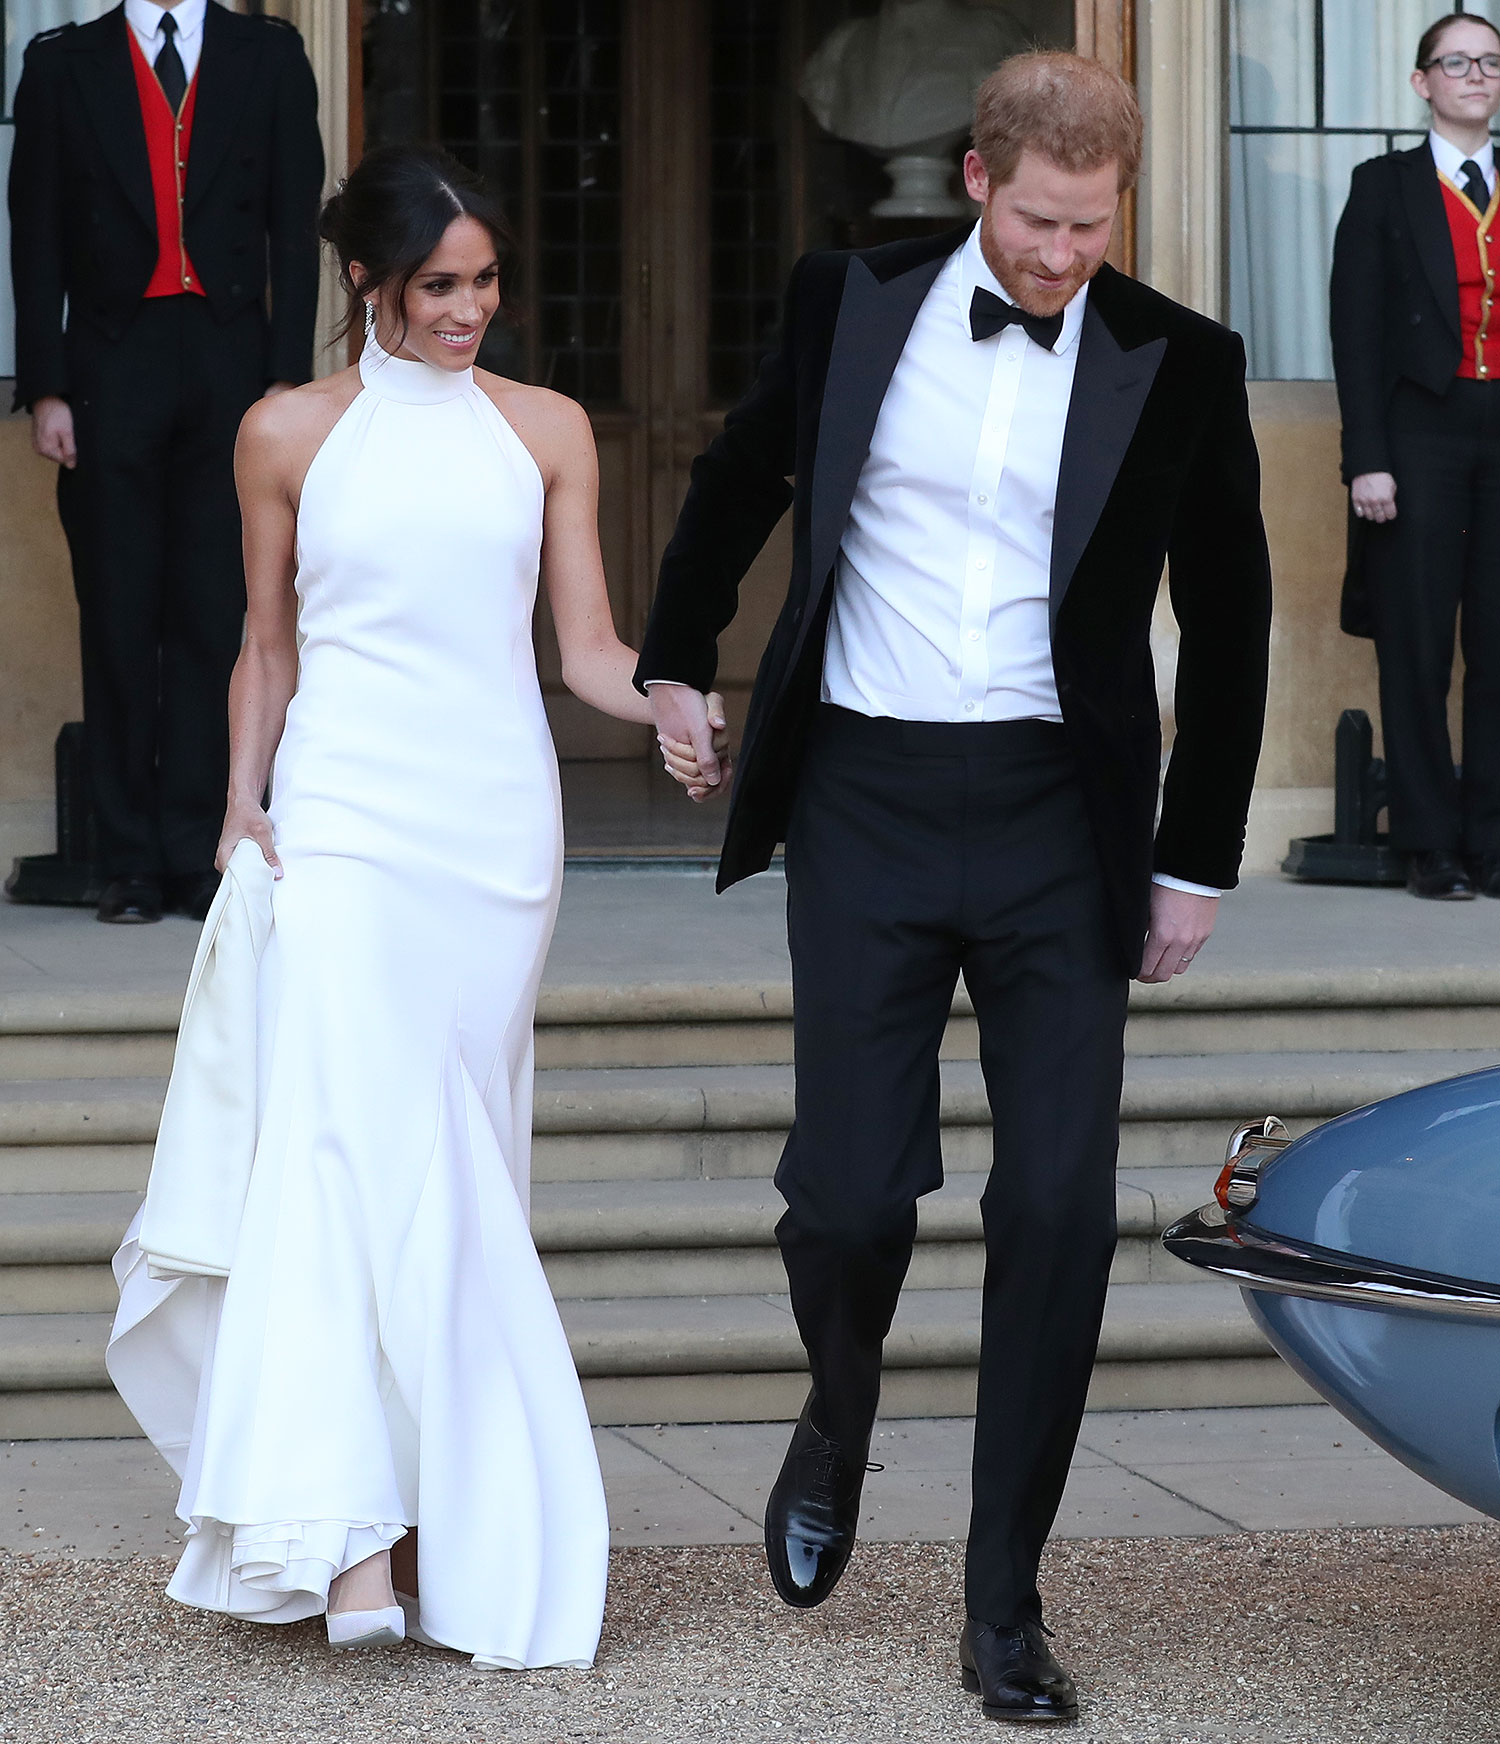 https://people.com/royals/meghan-markle-reception-dress-stars-who-rocked-similar-looks/#meghan-markle